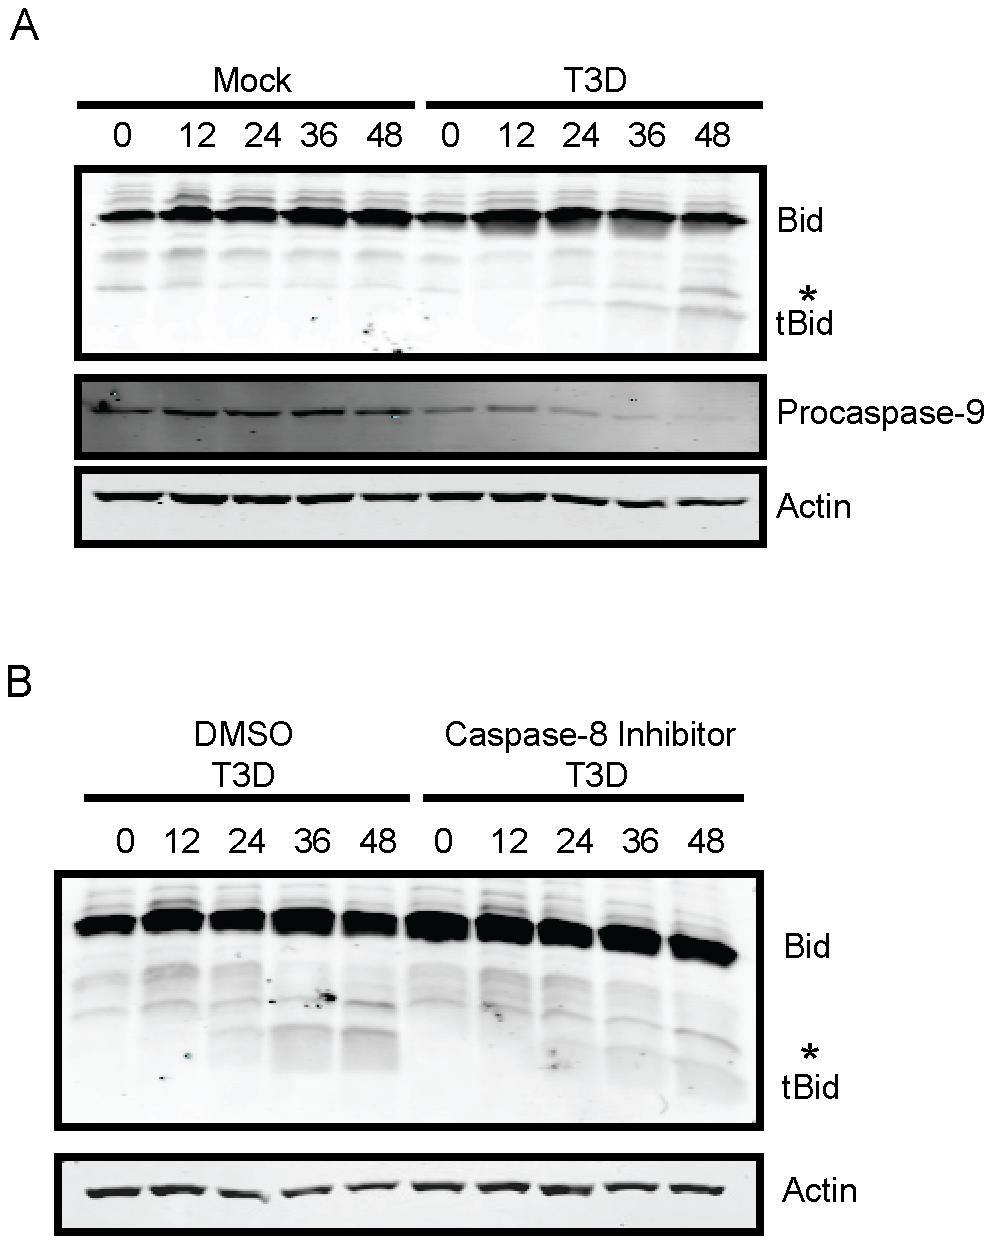 Bid is cleaved following reovirus infection of murine fibroblasts.